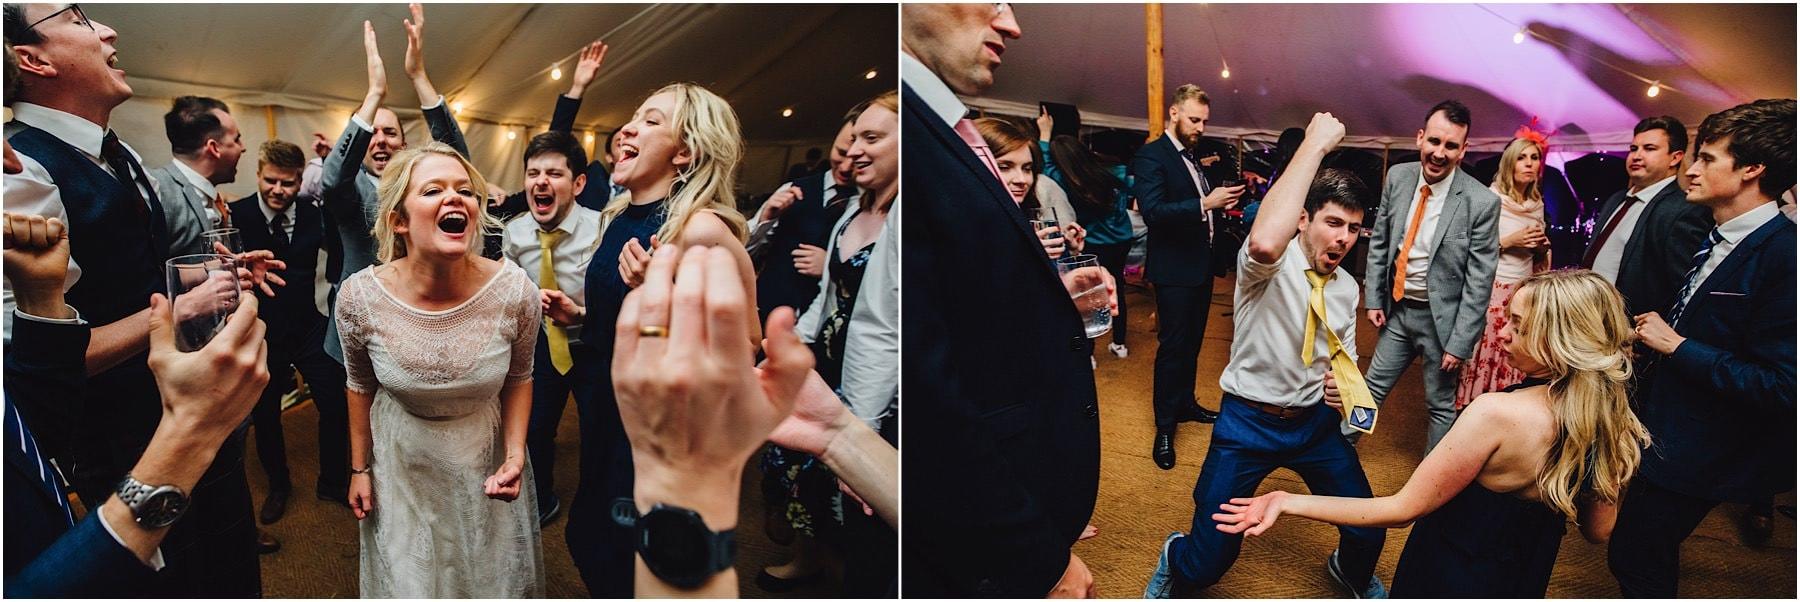 crazy dance floor at a wedding